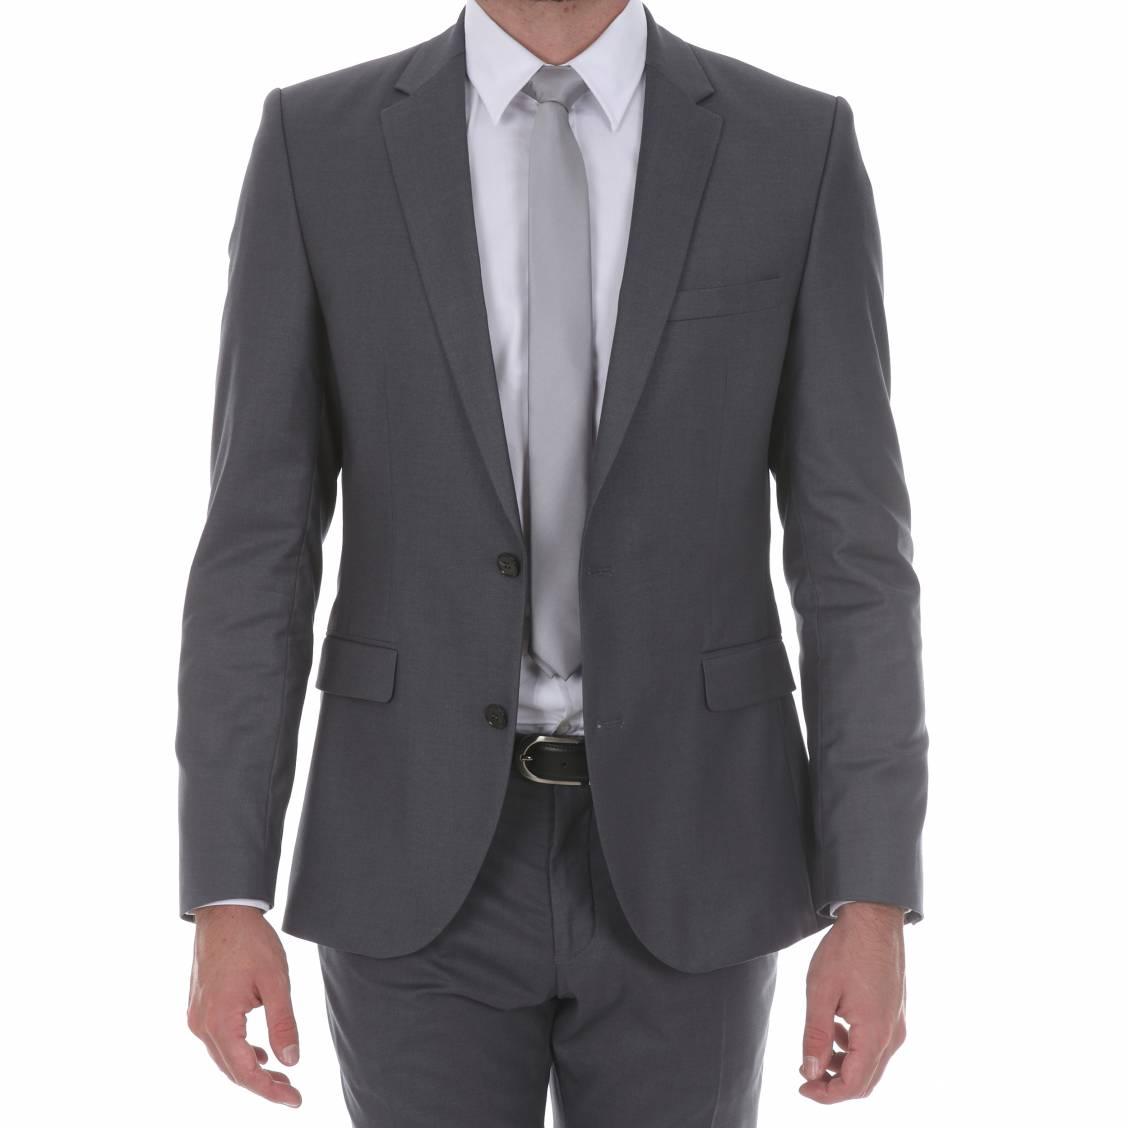 veste de costume selected logan gris fonc rue des hommes. Black Bedroom Furniture Sets. Home Design Ideas